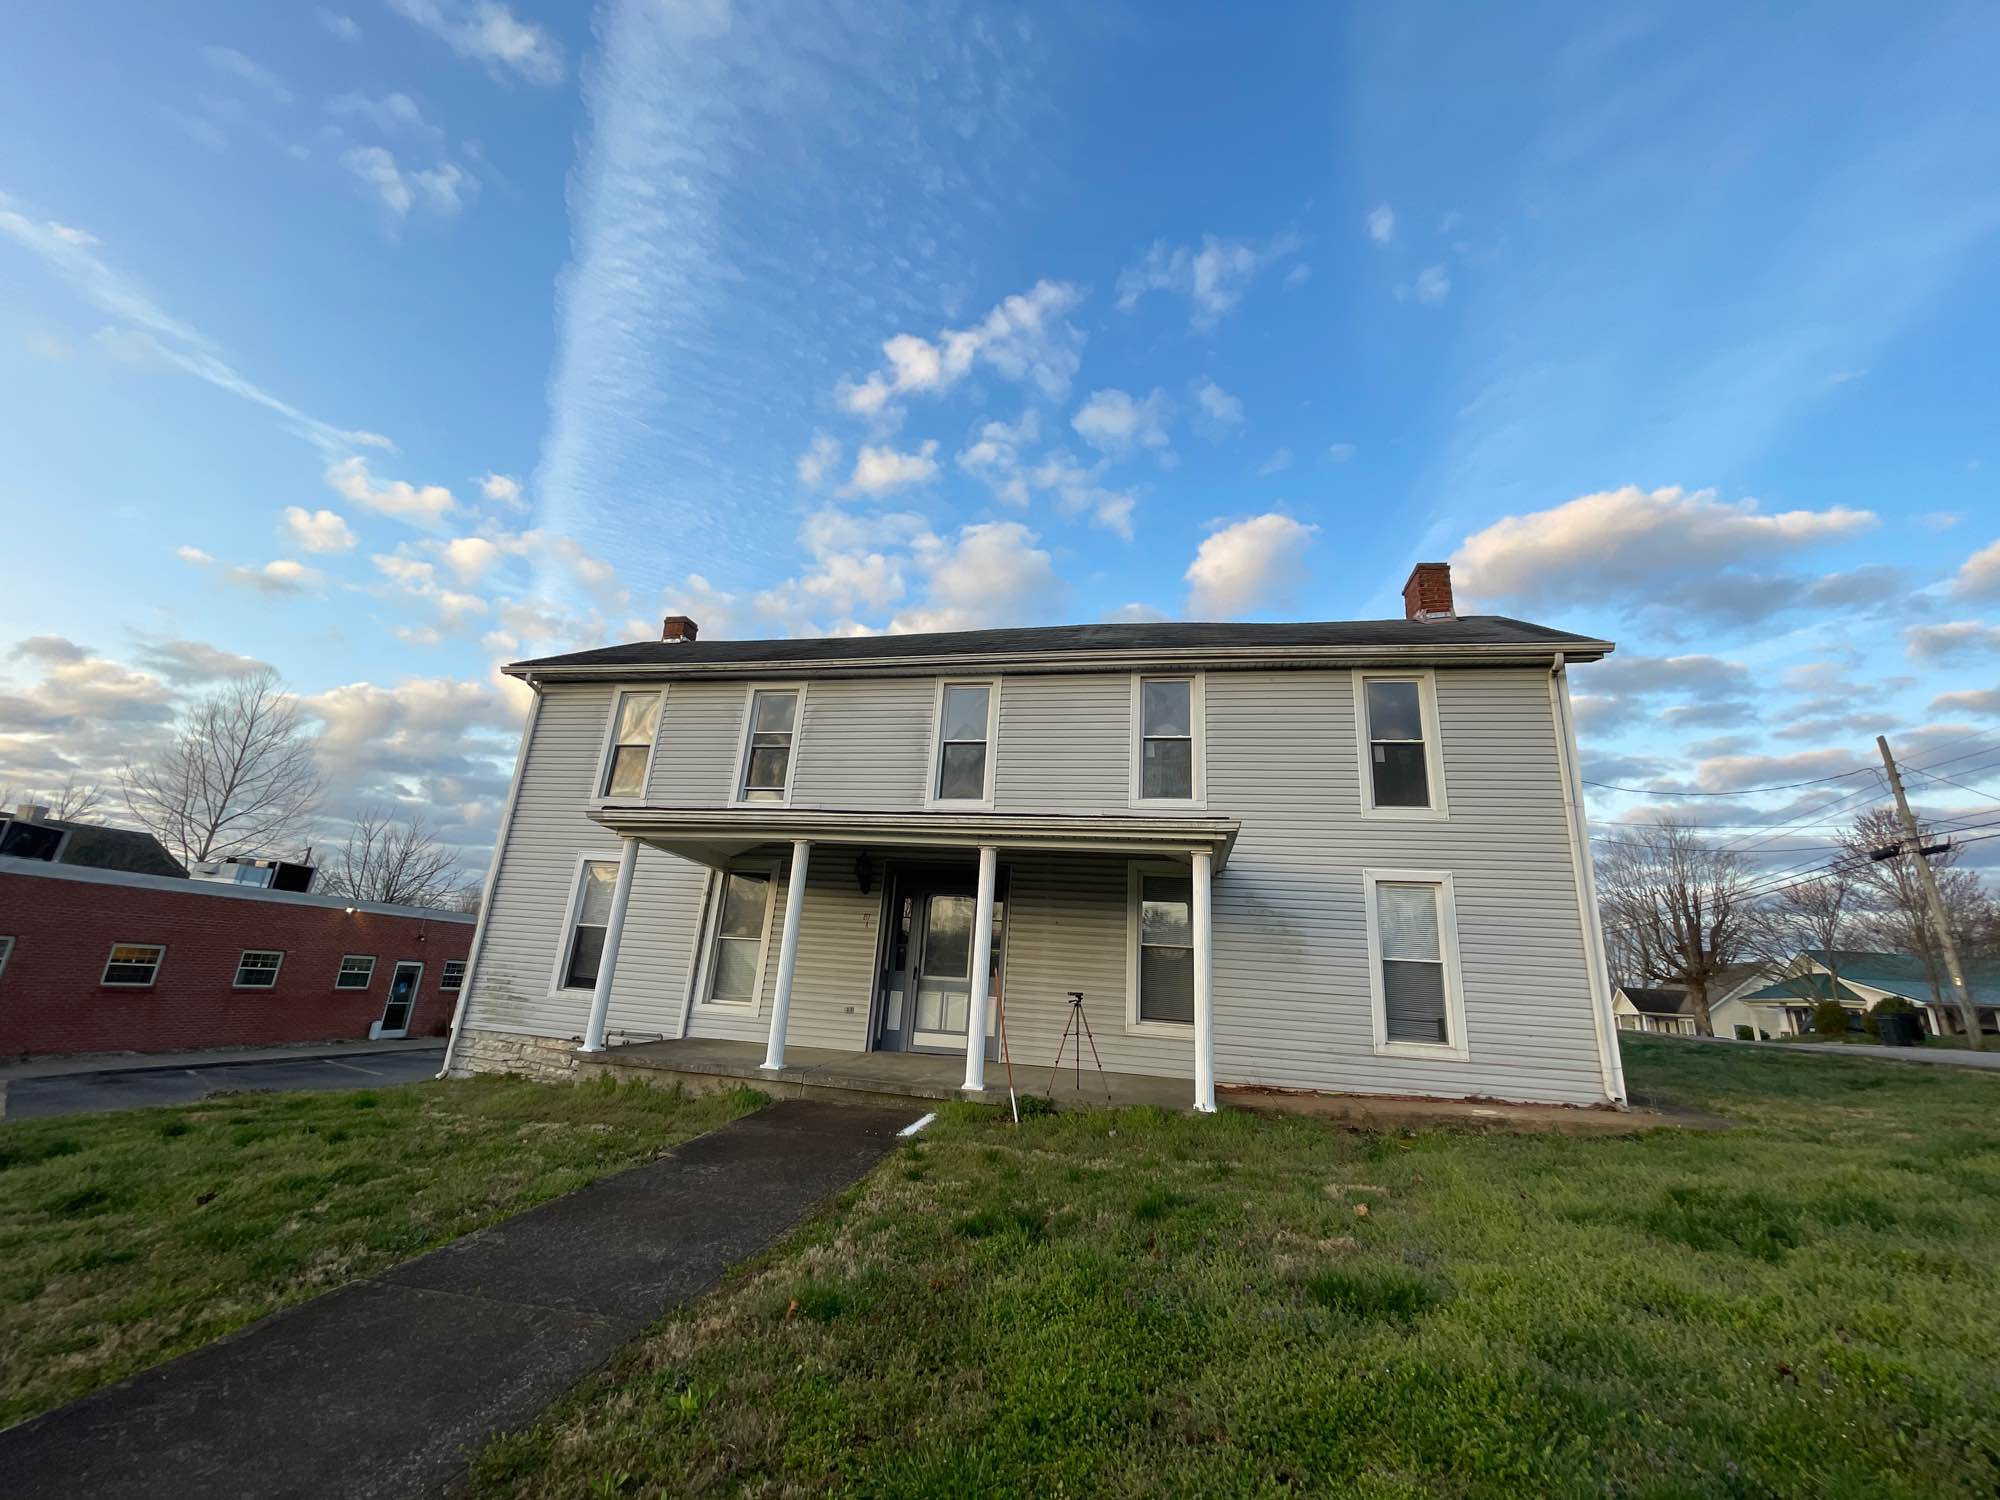 217 N Washington St, Munfordville, KY